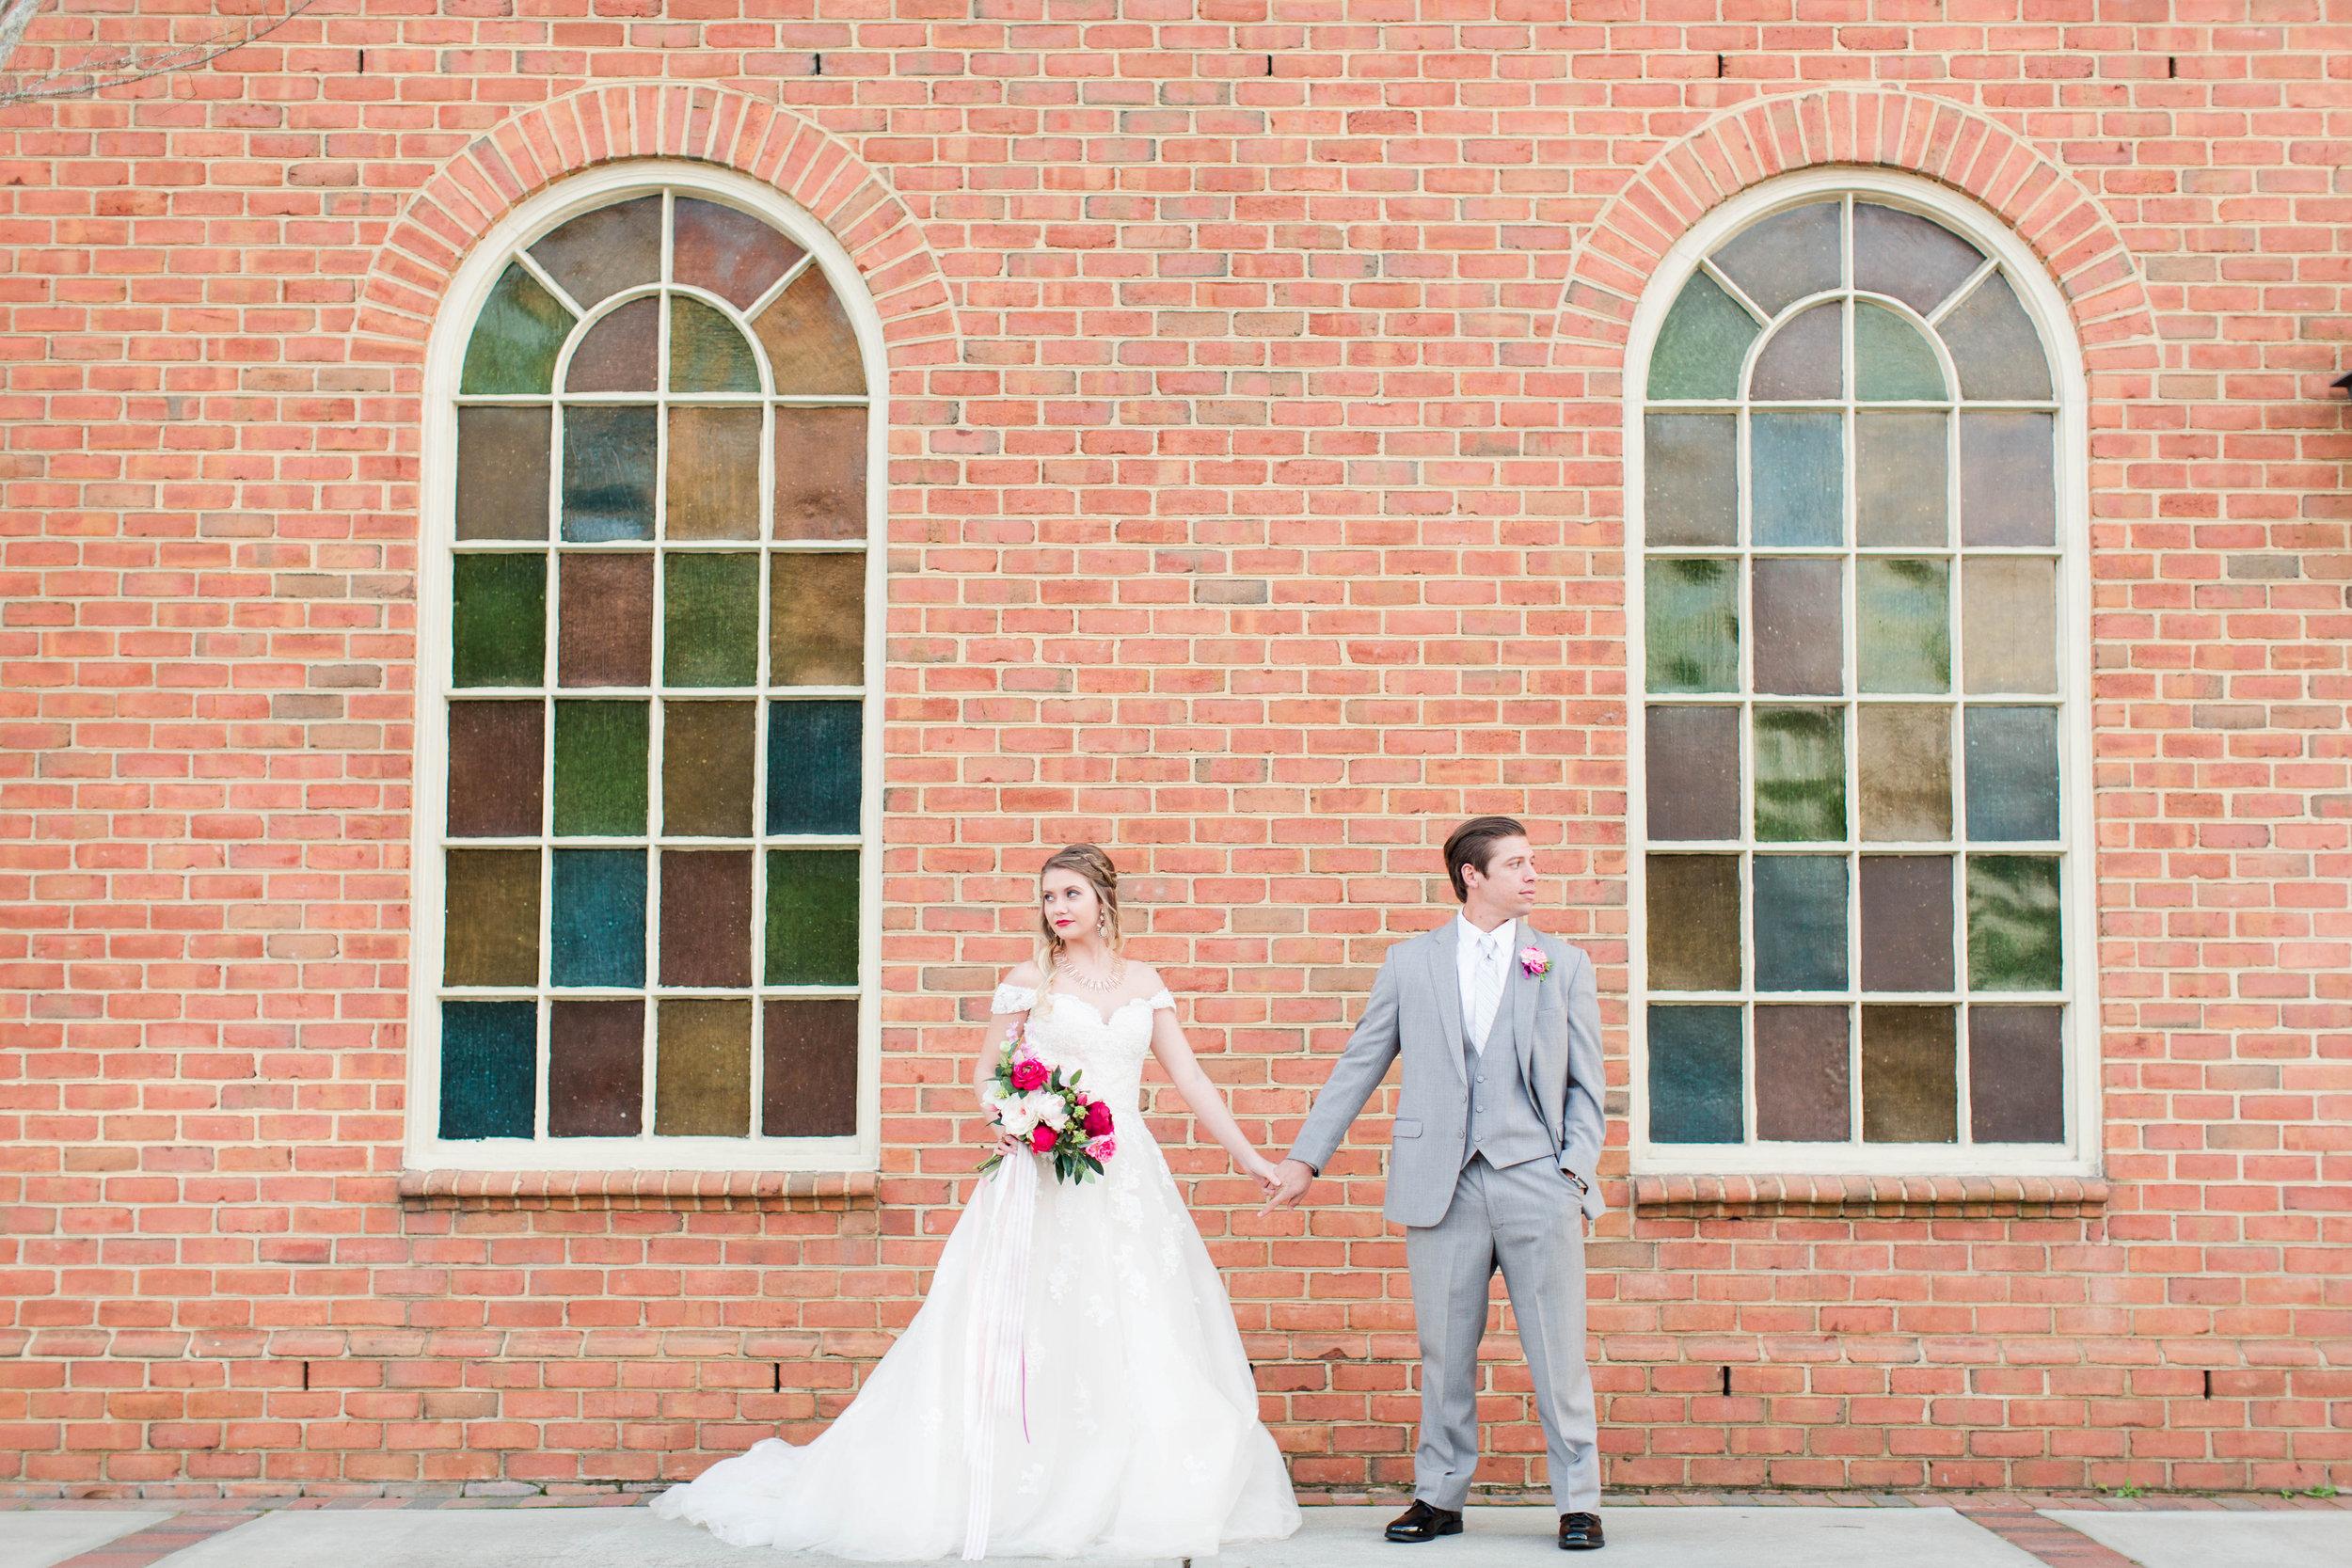 afloral-fake-flower-wedding-ivory-and-beau-bridal-boutique-maggie-sottero-saffron-the-hall-on-vine-wedding-statesboro-wedding-savannah-wedding-kristian-designs-rachel-strickland-photography-savannah-bridal-southern-bride-savannah-bride-16.jpg